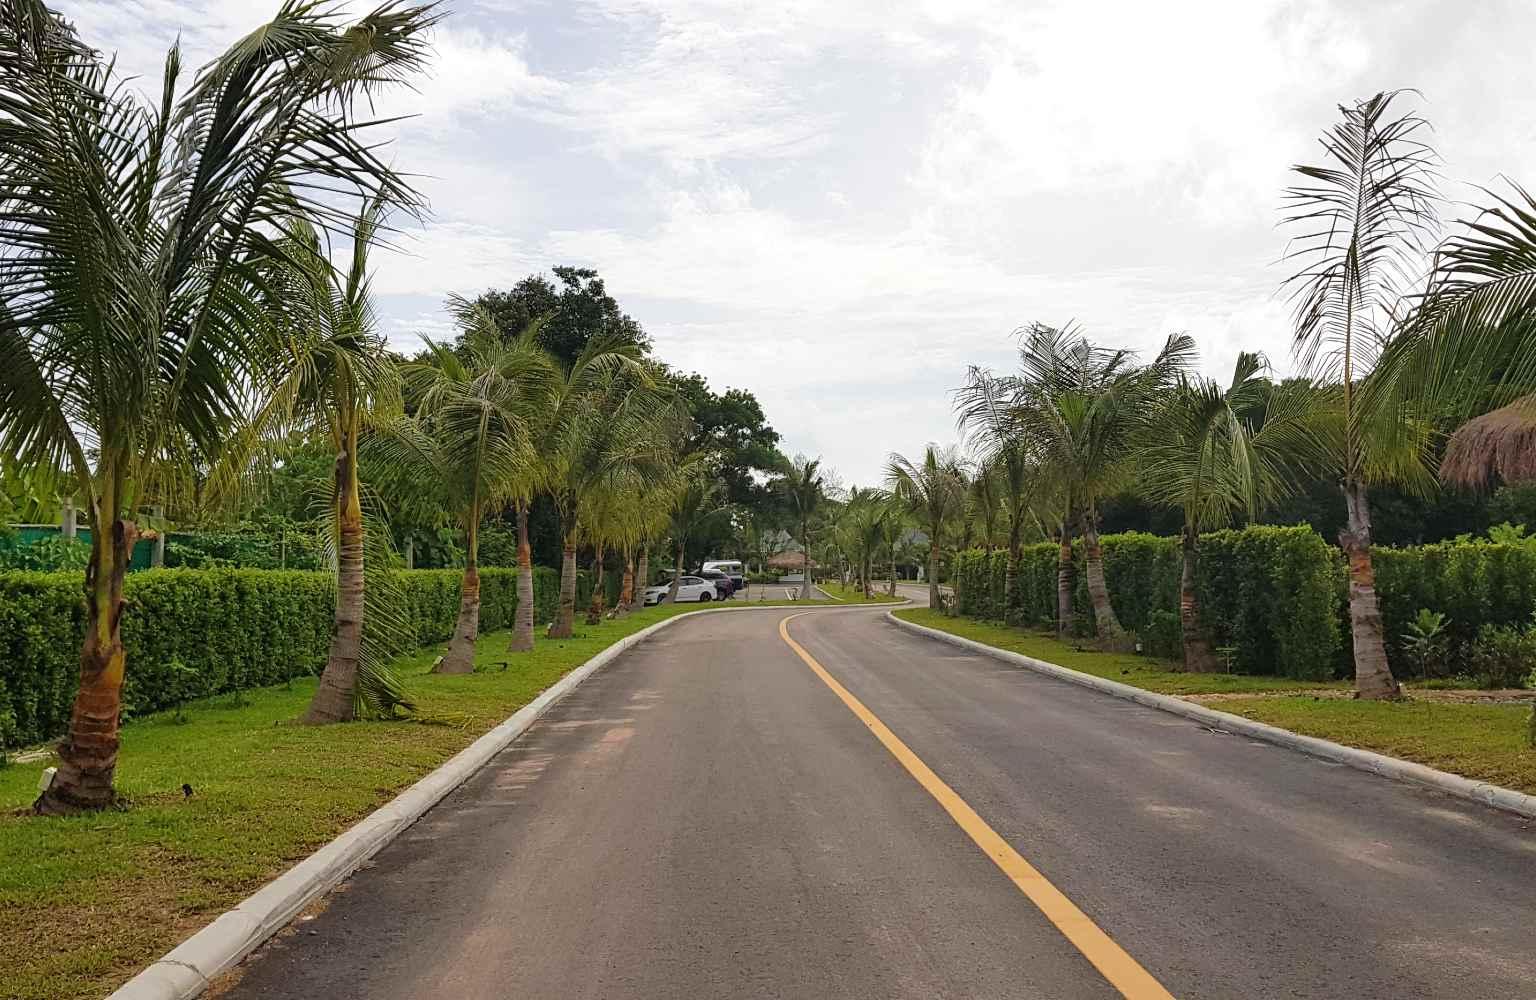 The road from the entrance to Lanta Casa Blanca on Koh Lanta